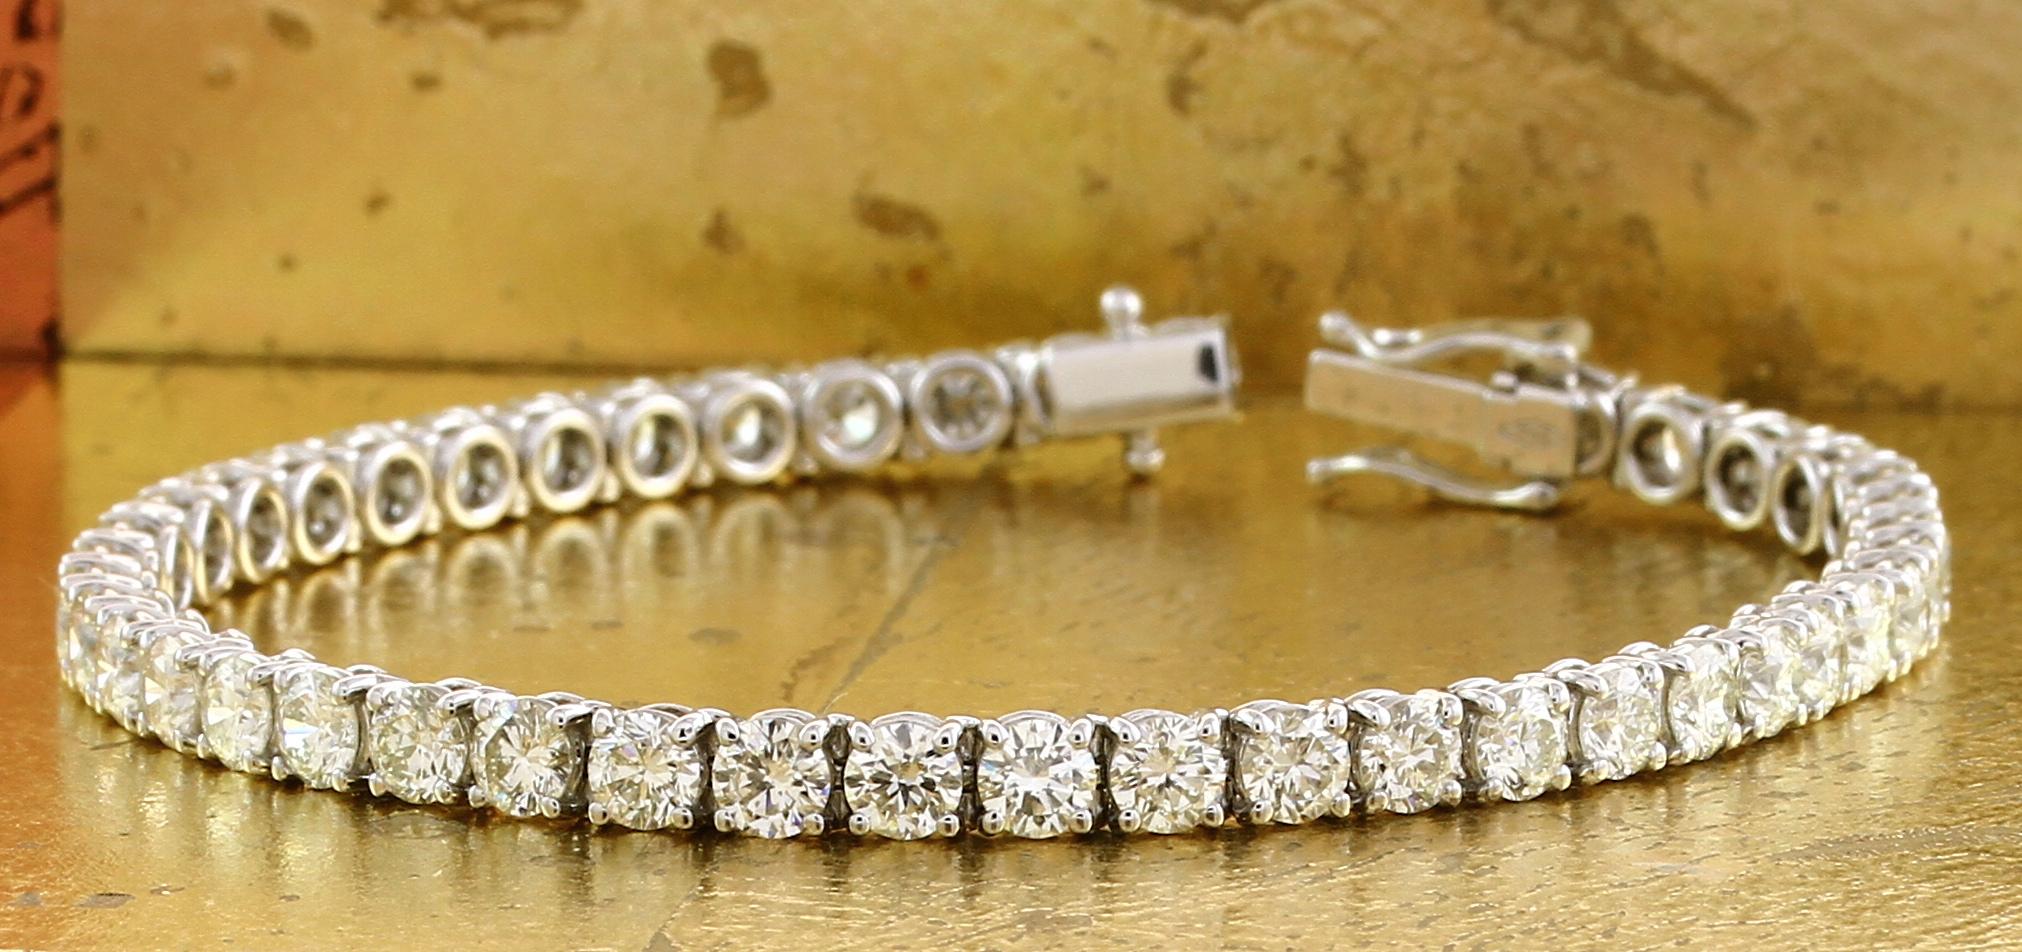 Tennis Bracelet set with Round Diamonds - Item No: 0013598